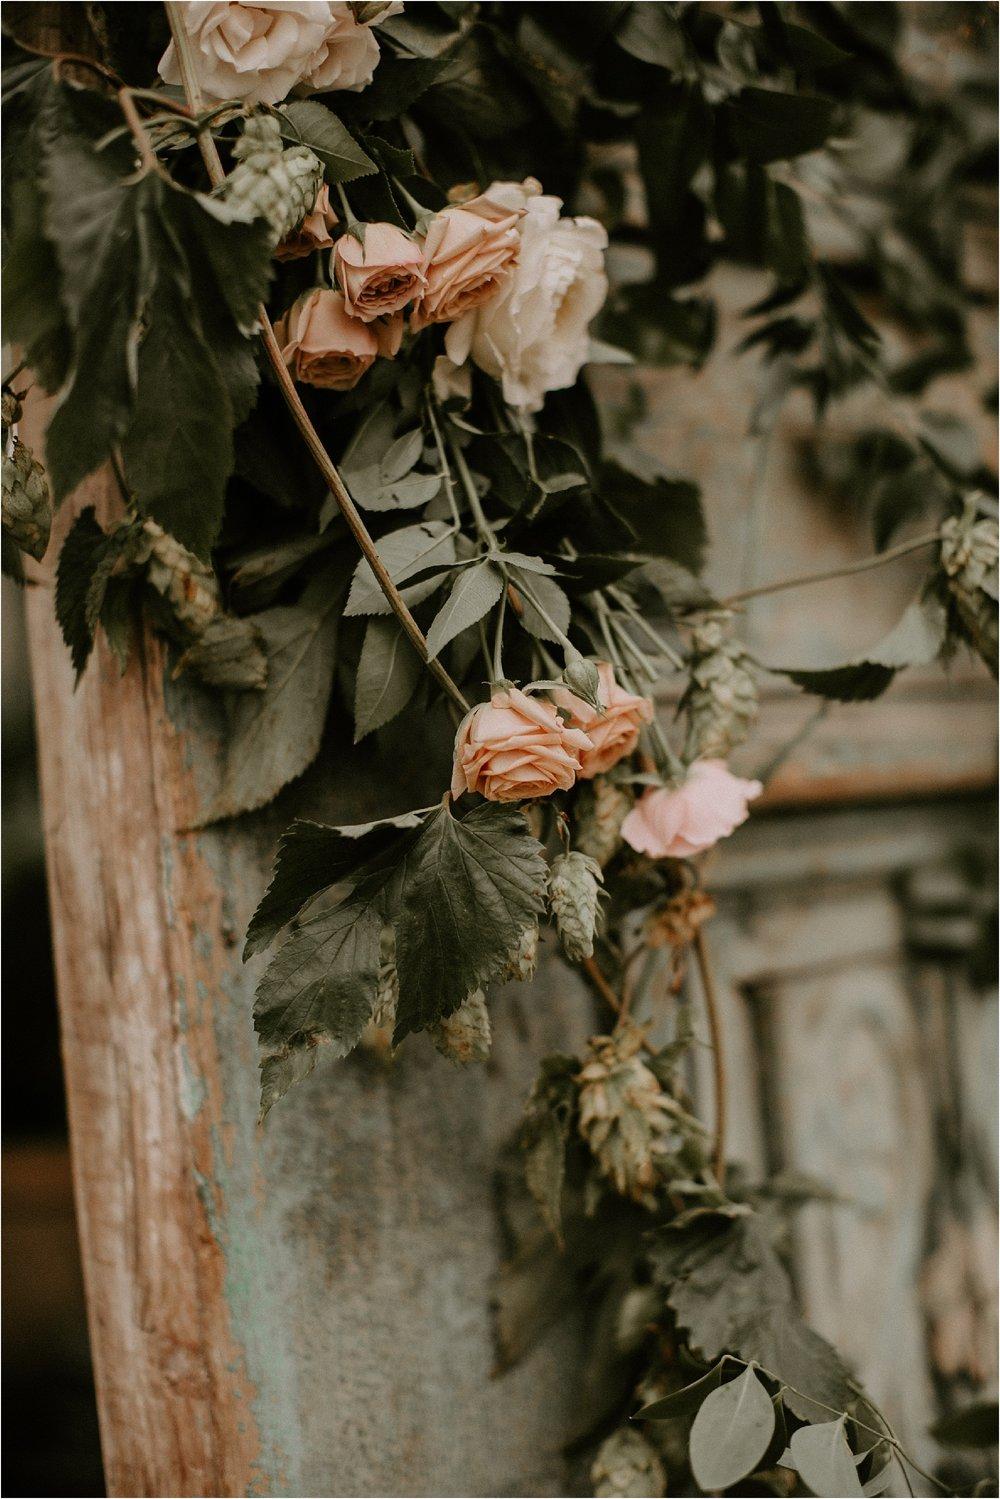 Sarah_Brookhart_Hortulus_Farm_Garden_and_Nursey_Wedding_Photographer_0043.jpg